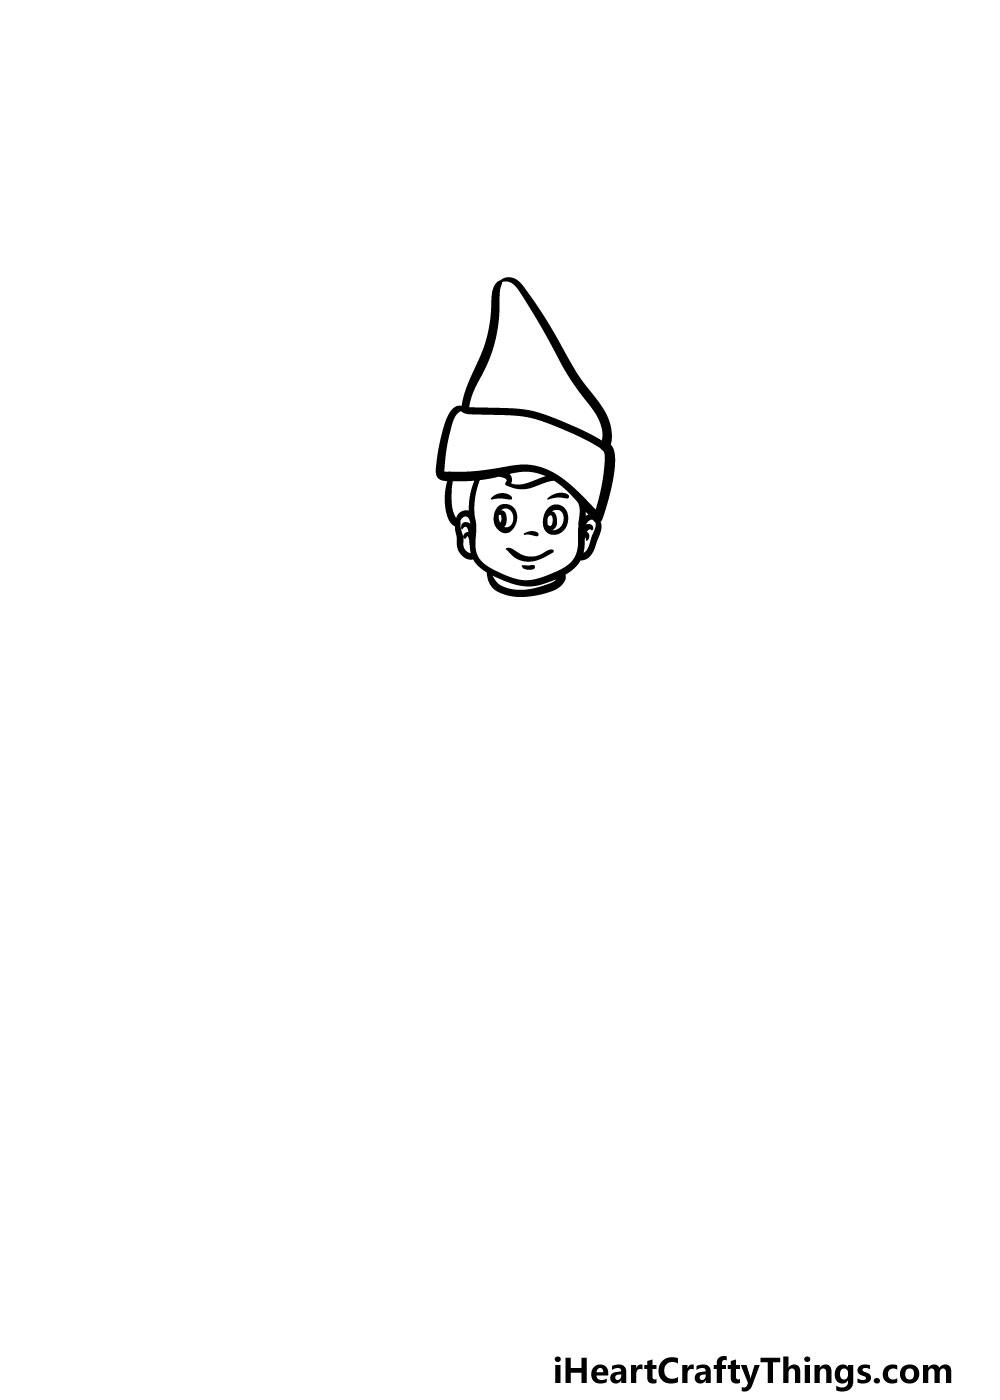 drawing an elf on a shelf step 2